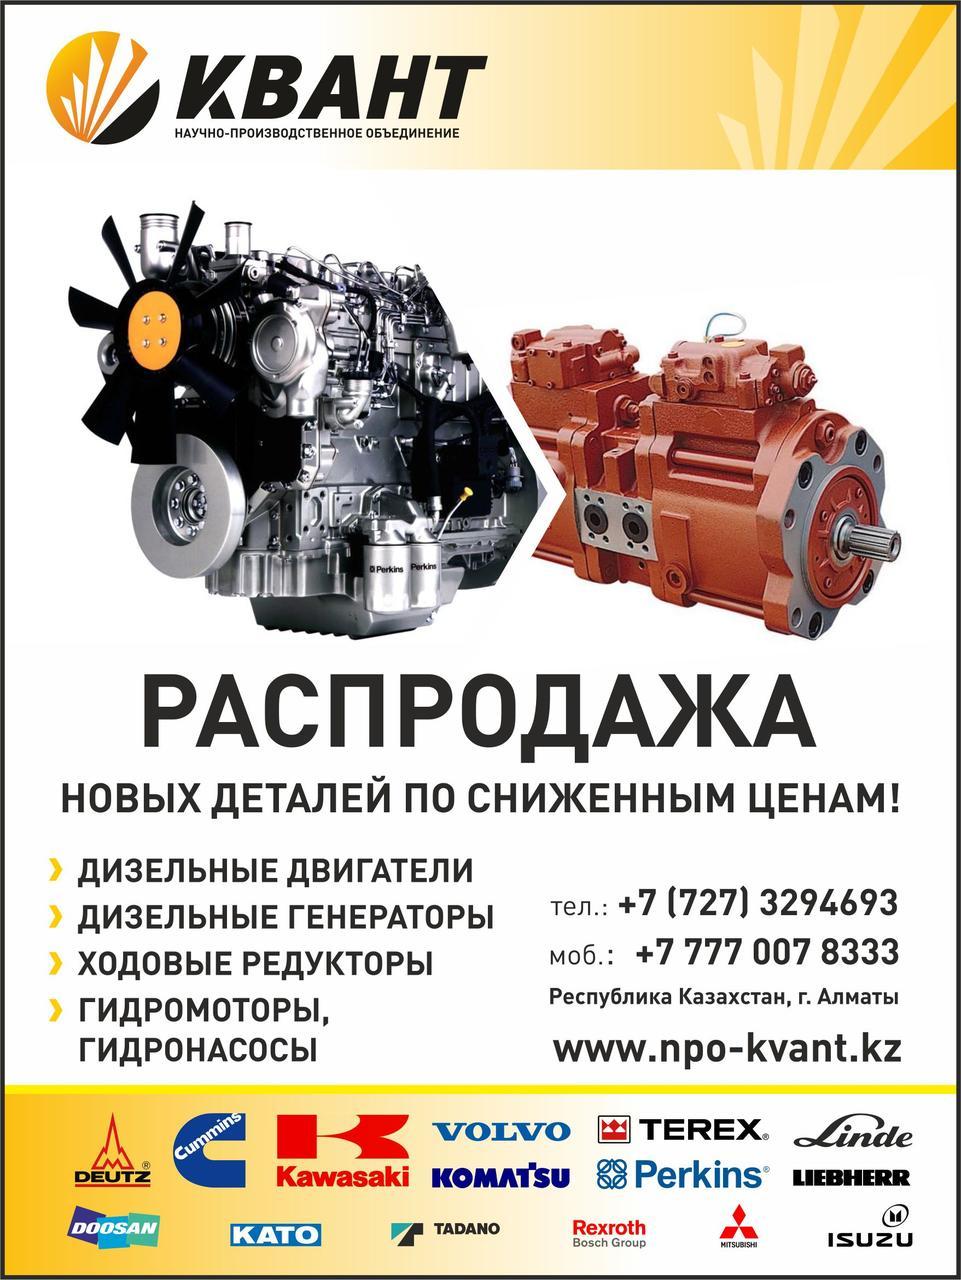 Двигатель Perkins 4012TESI, Perkins 4012-46TAG3A, Perkins 4016-61TRS1, 4016-61TRG2, Perkins 4016TAG2A